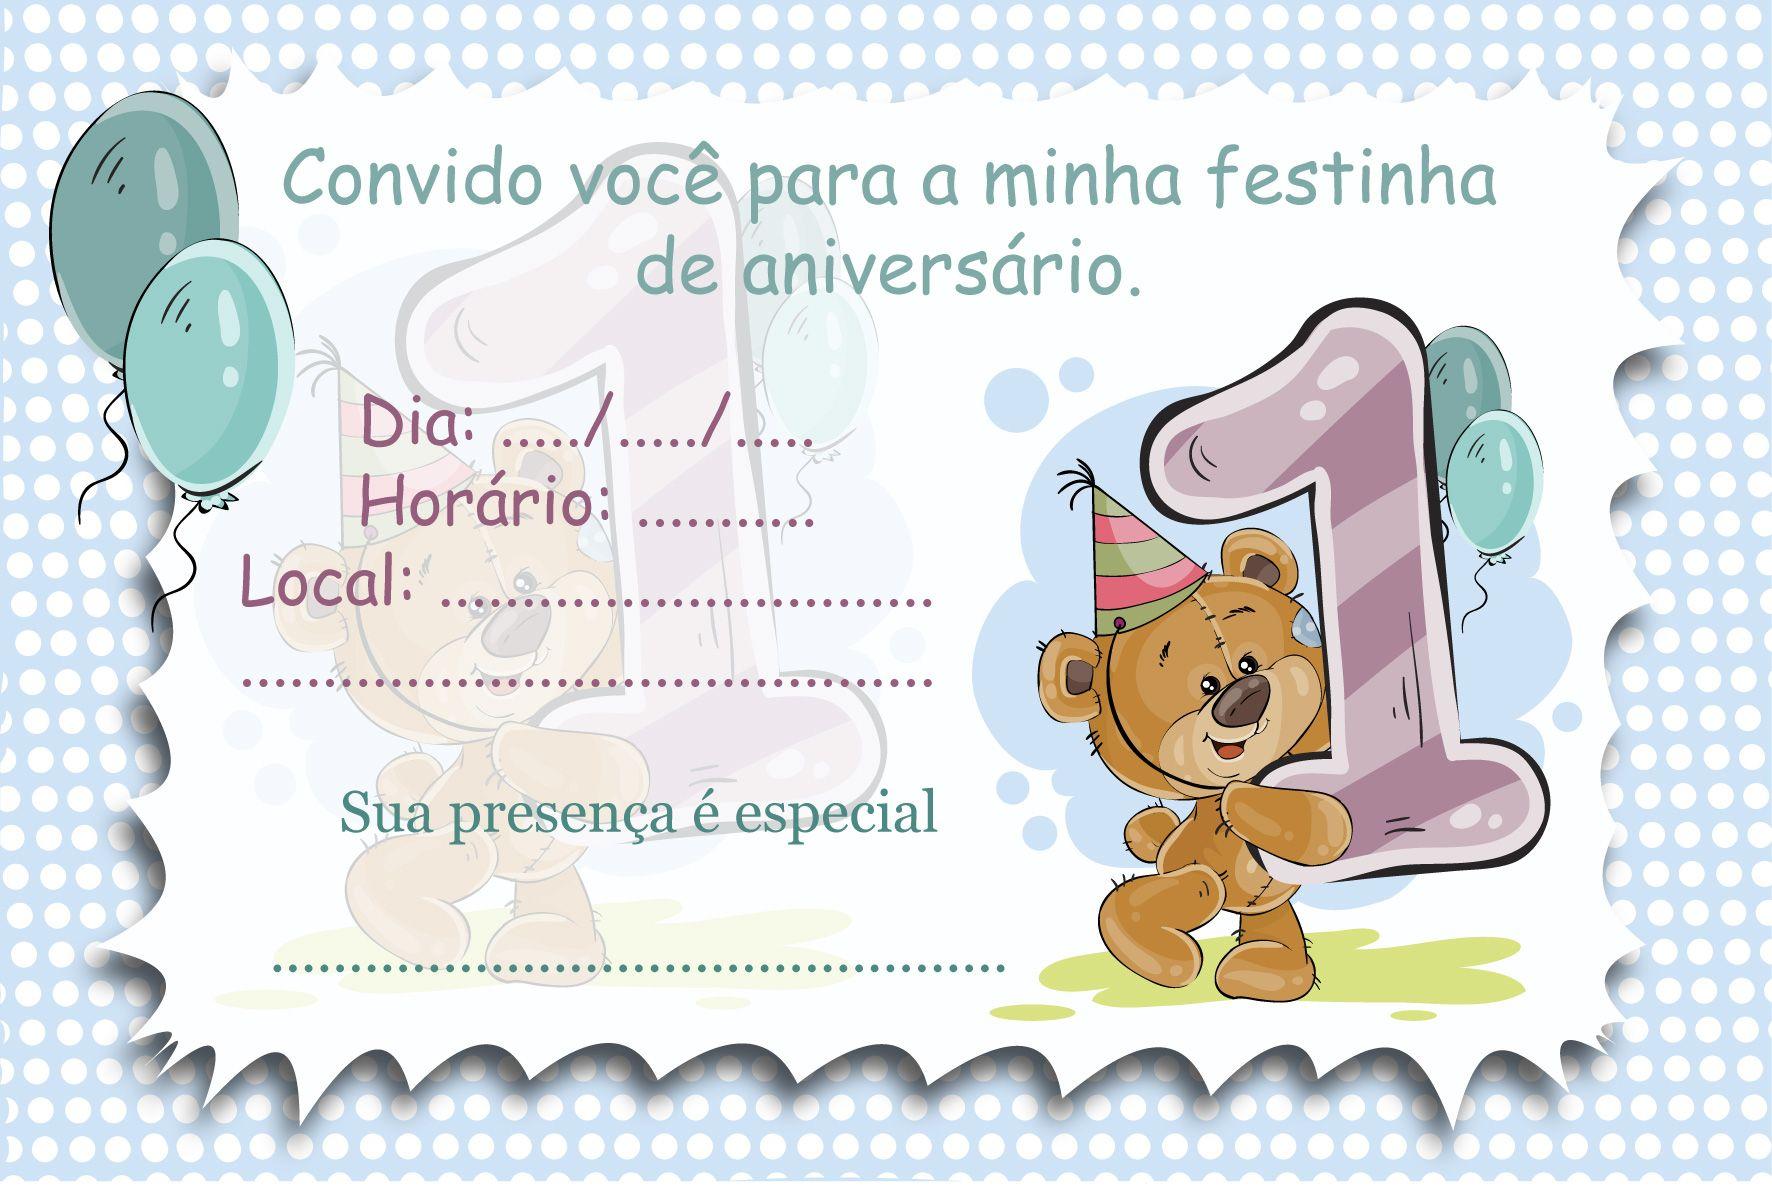 Surpresa E Arte Convite De Aniversario Convite Aniversario Infantil